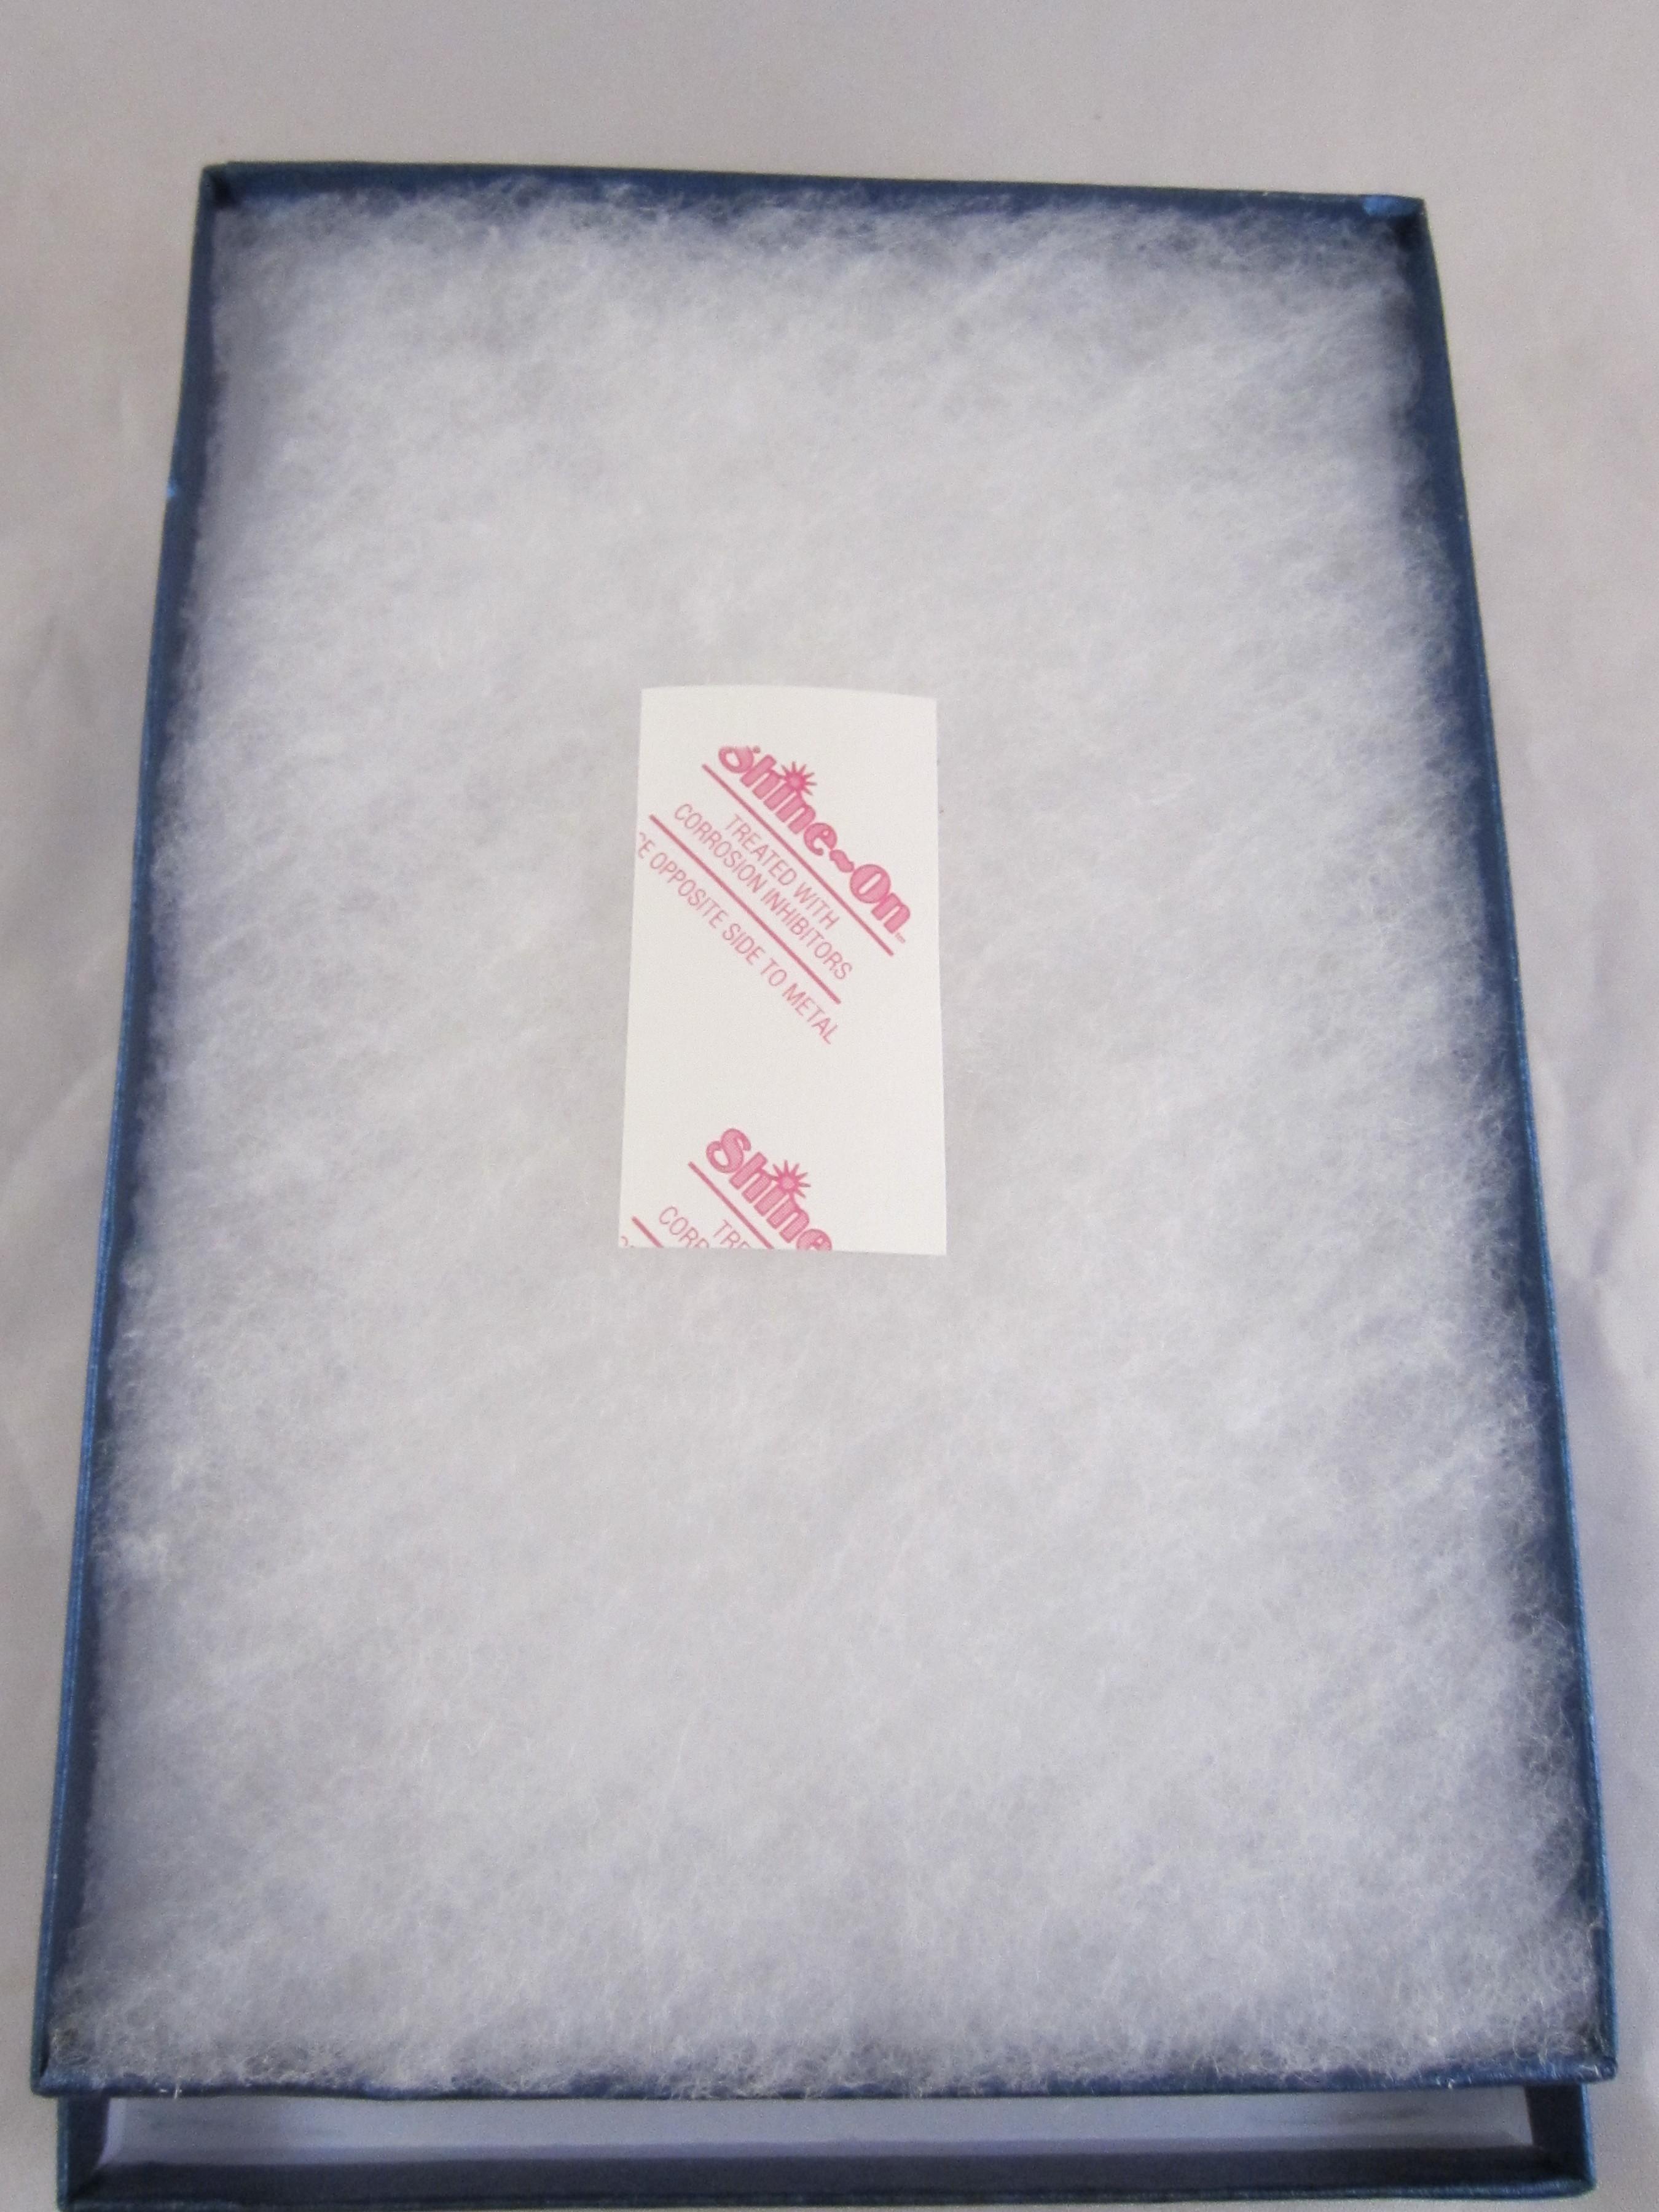 jewelry box with anti-tarnish paper